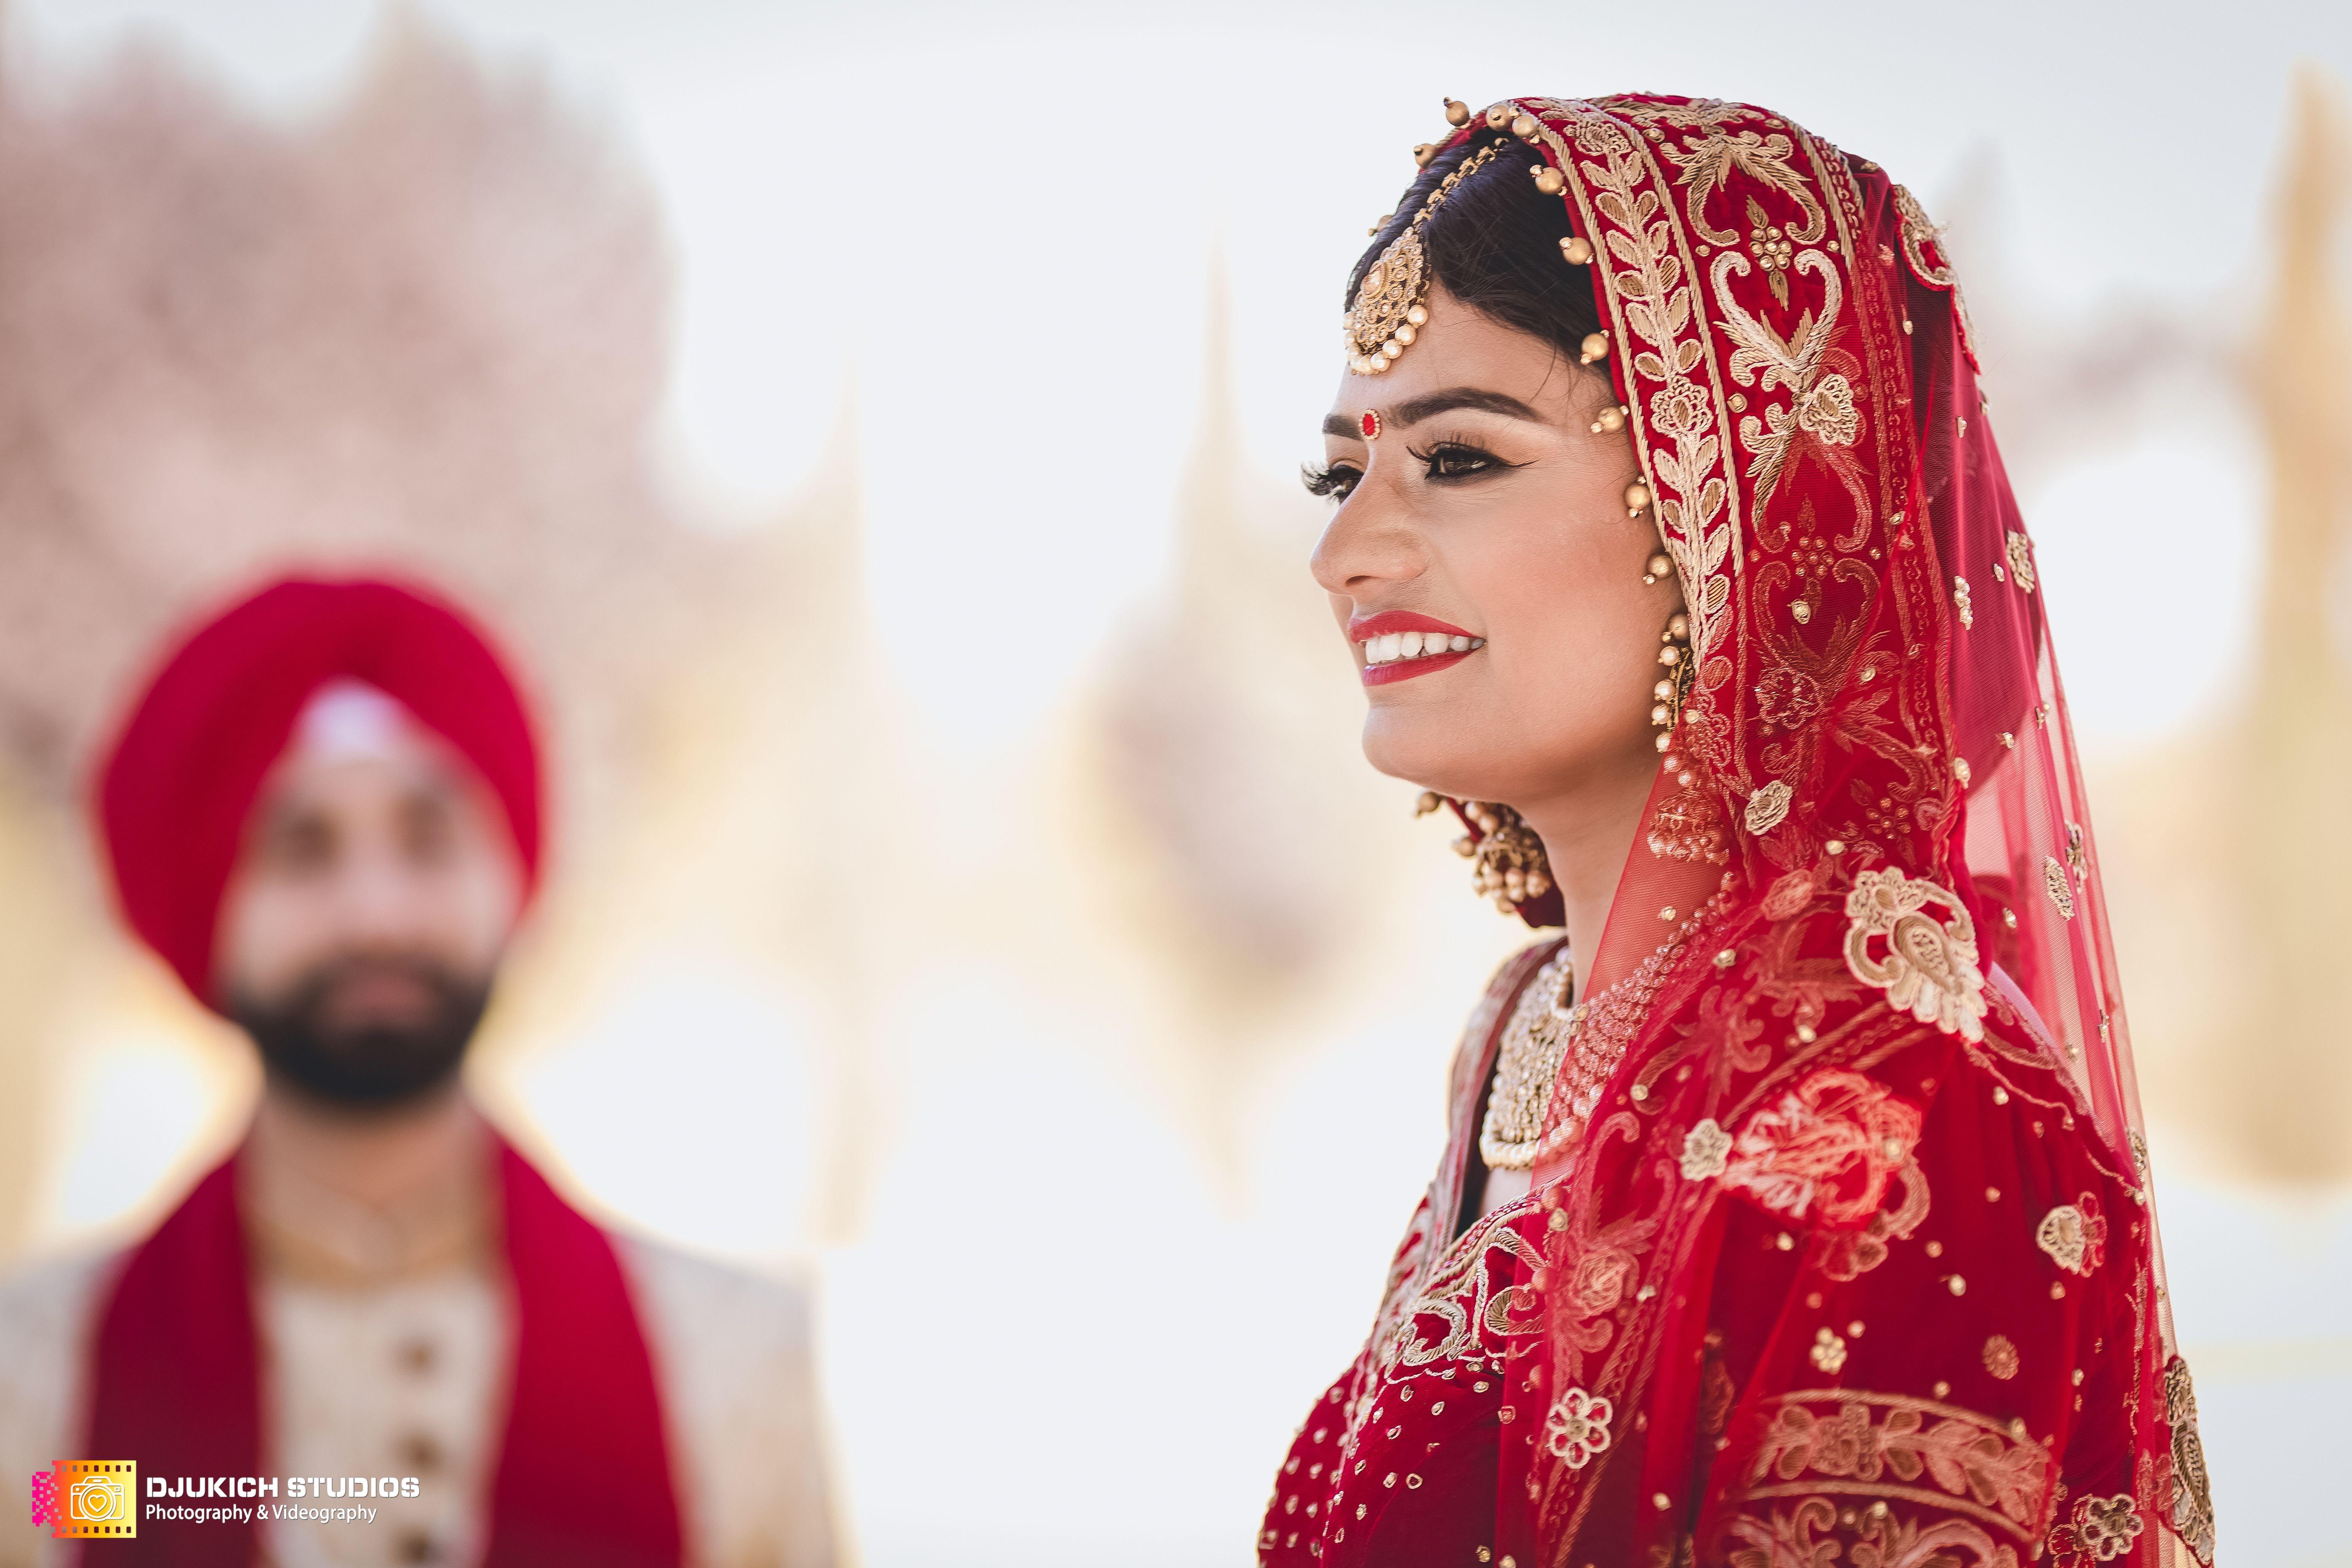 South Indian Wedding Video Highlights Of Sruthi Mridul Youtube Indian Wedding Album Design Wedding Album Cover Design Wedding Album Design Layout